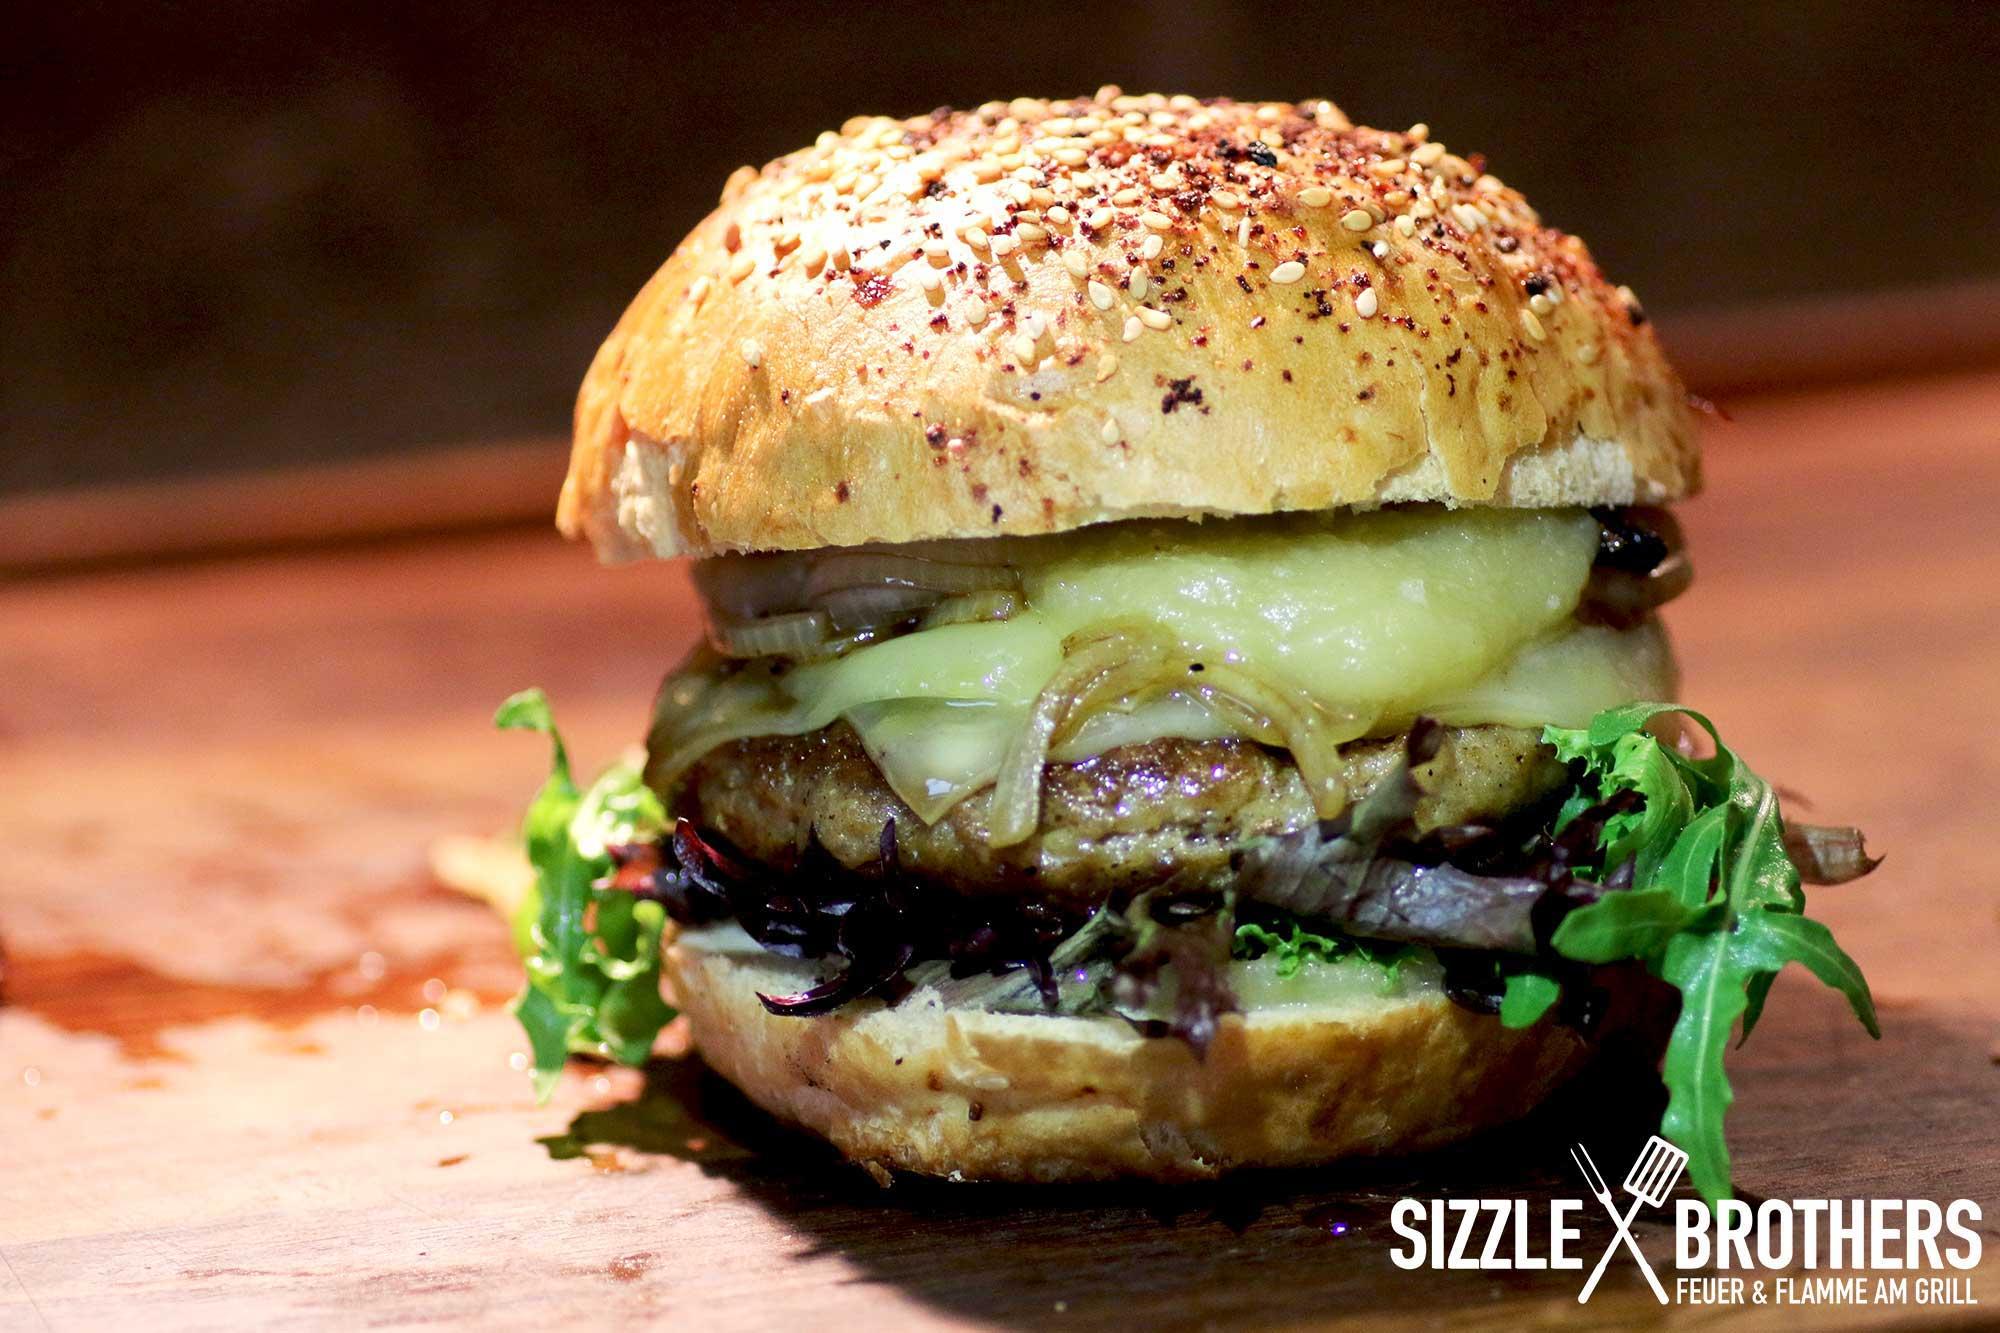 Mangalitza Burger